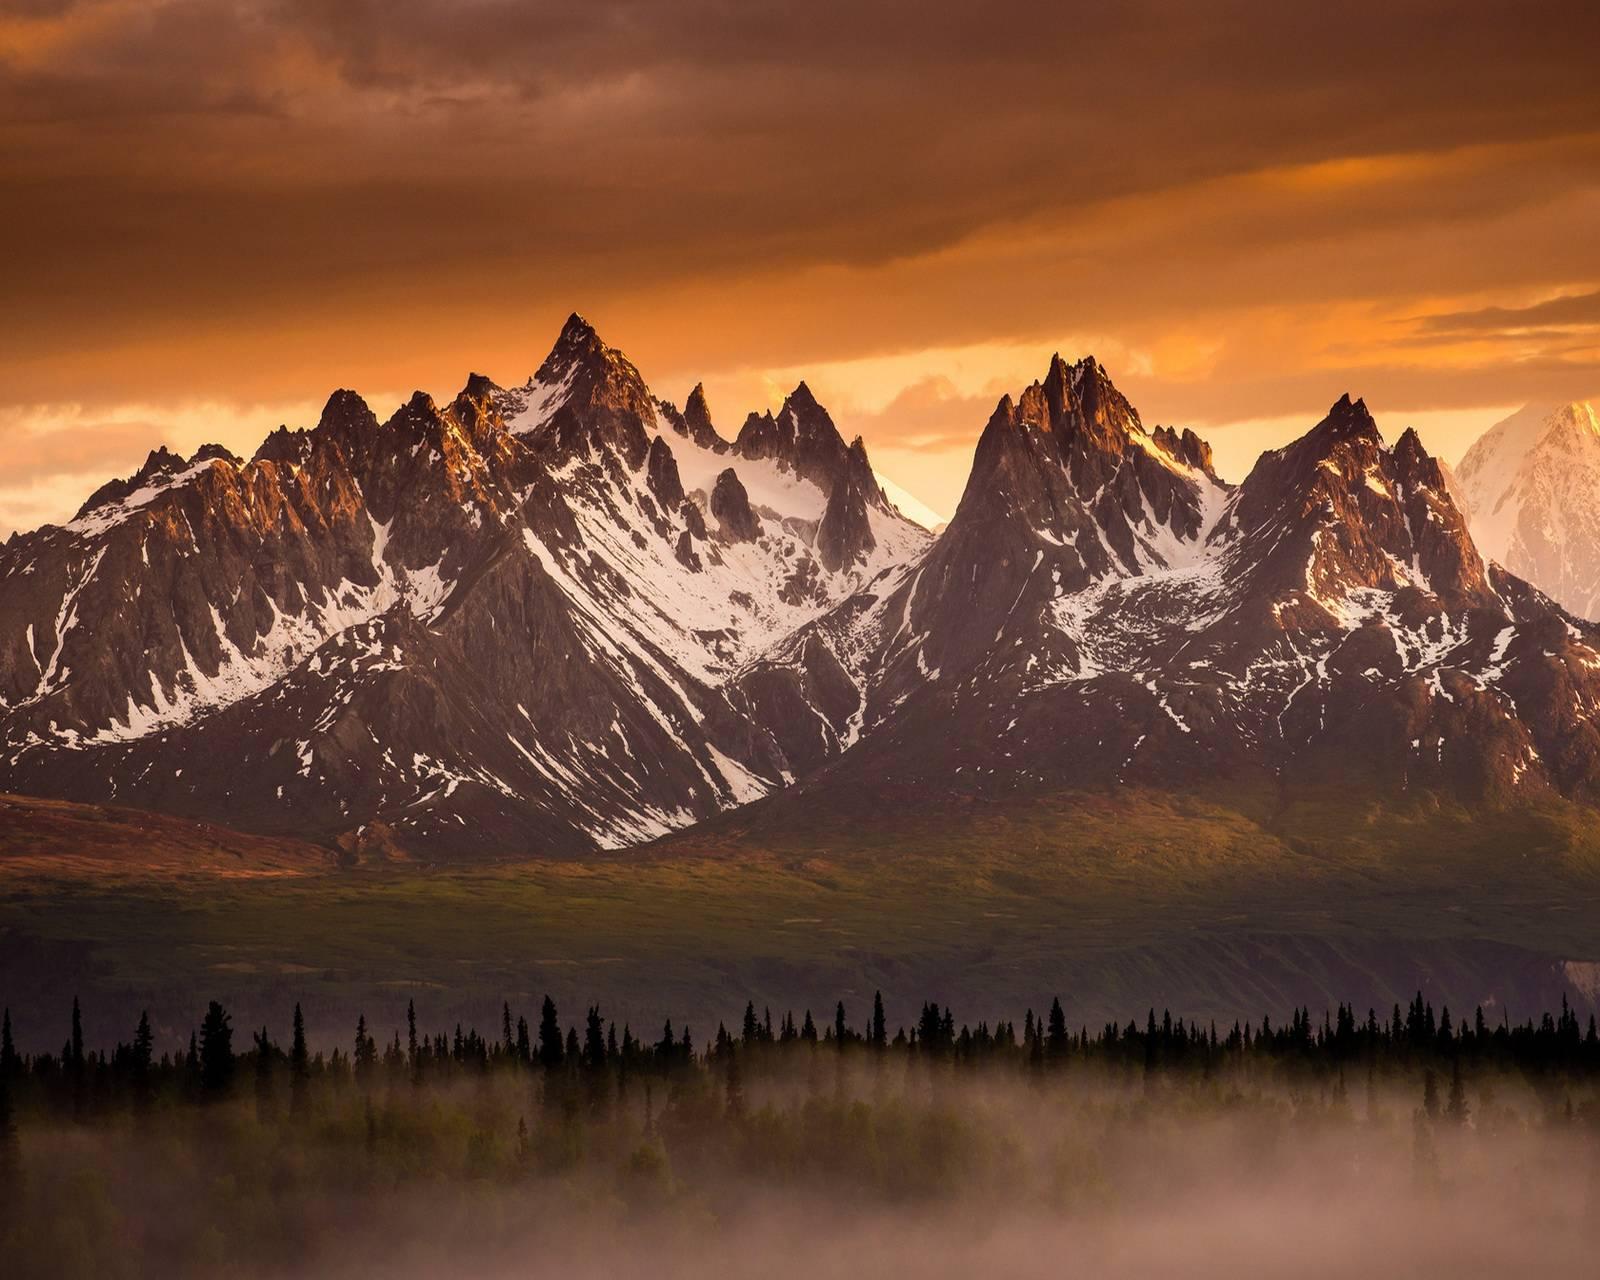 Mountains View Hd